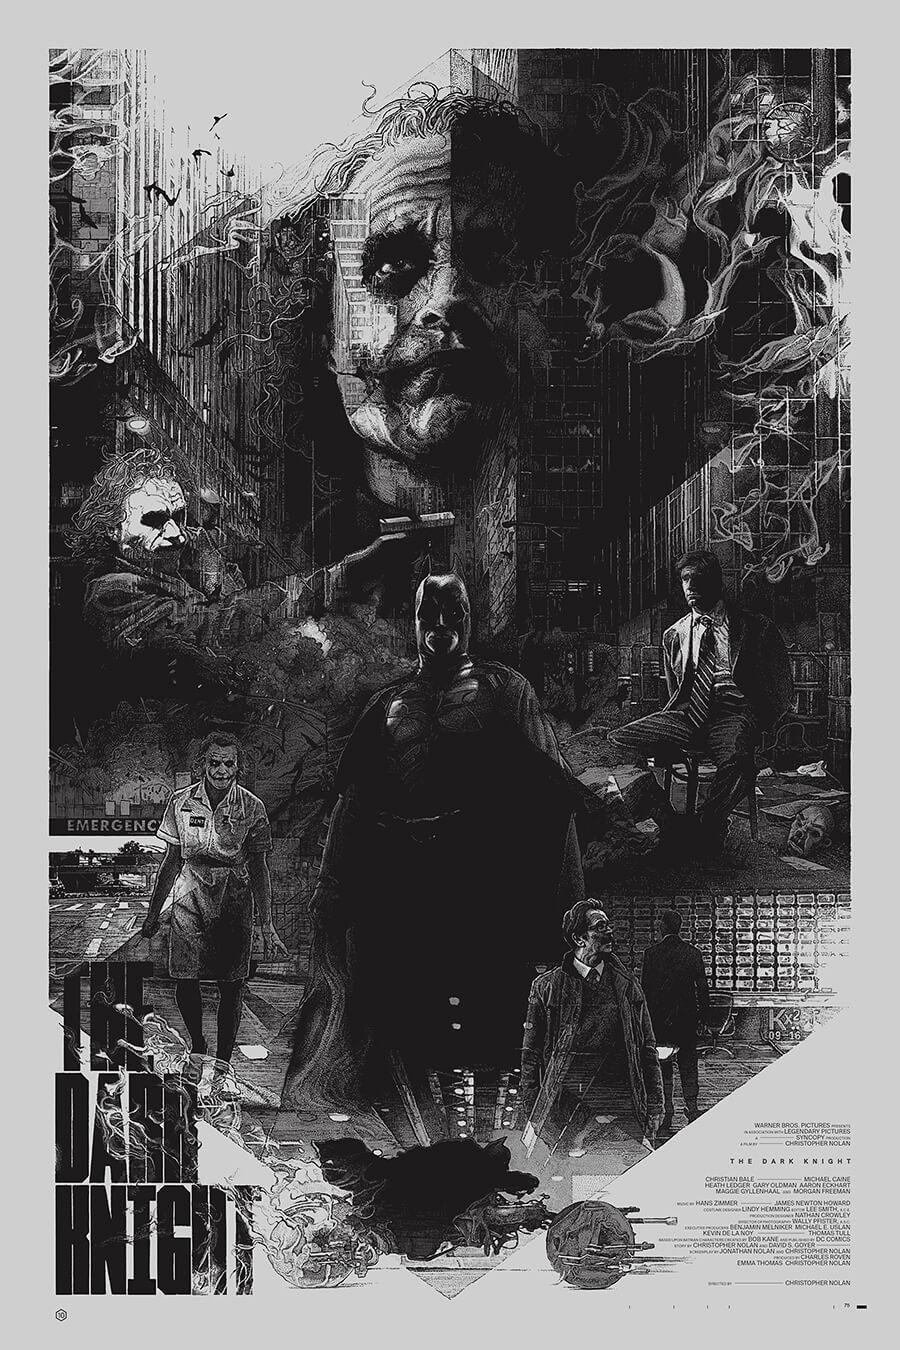 Stunning Poster Art for Christopher Nolan's DARK KNIGHT